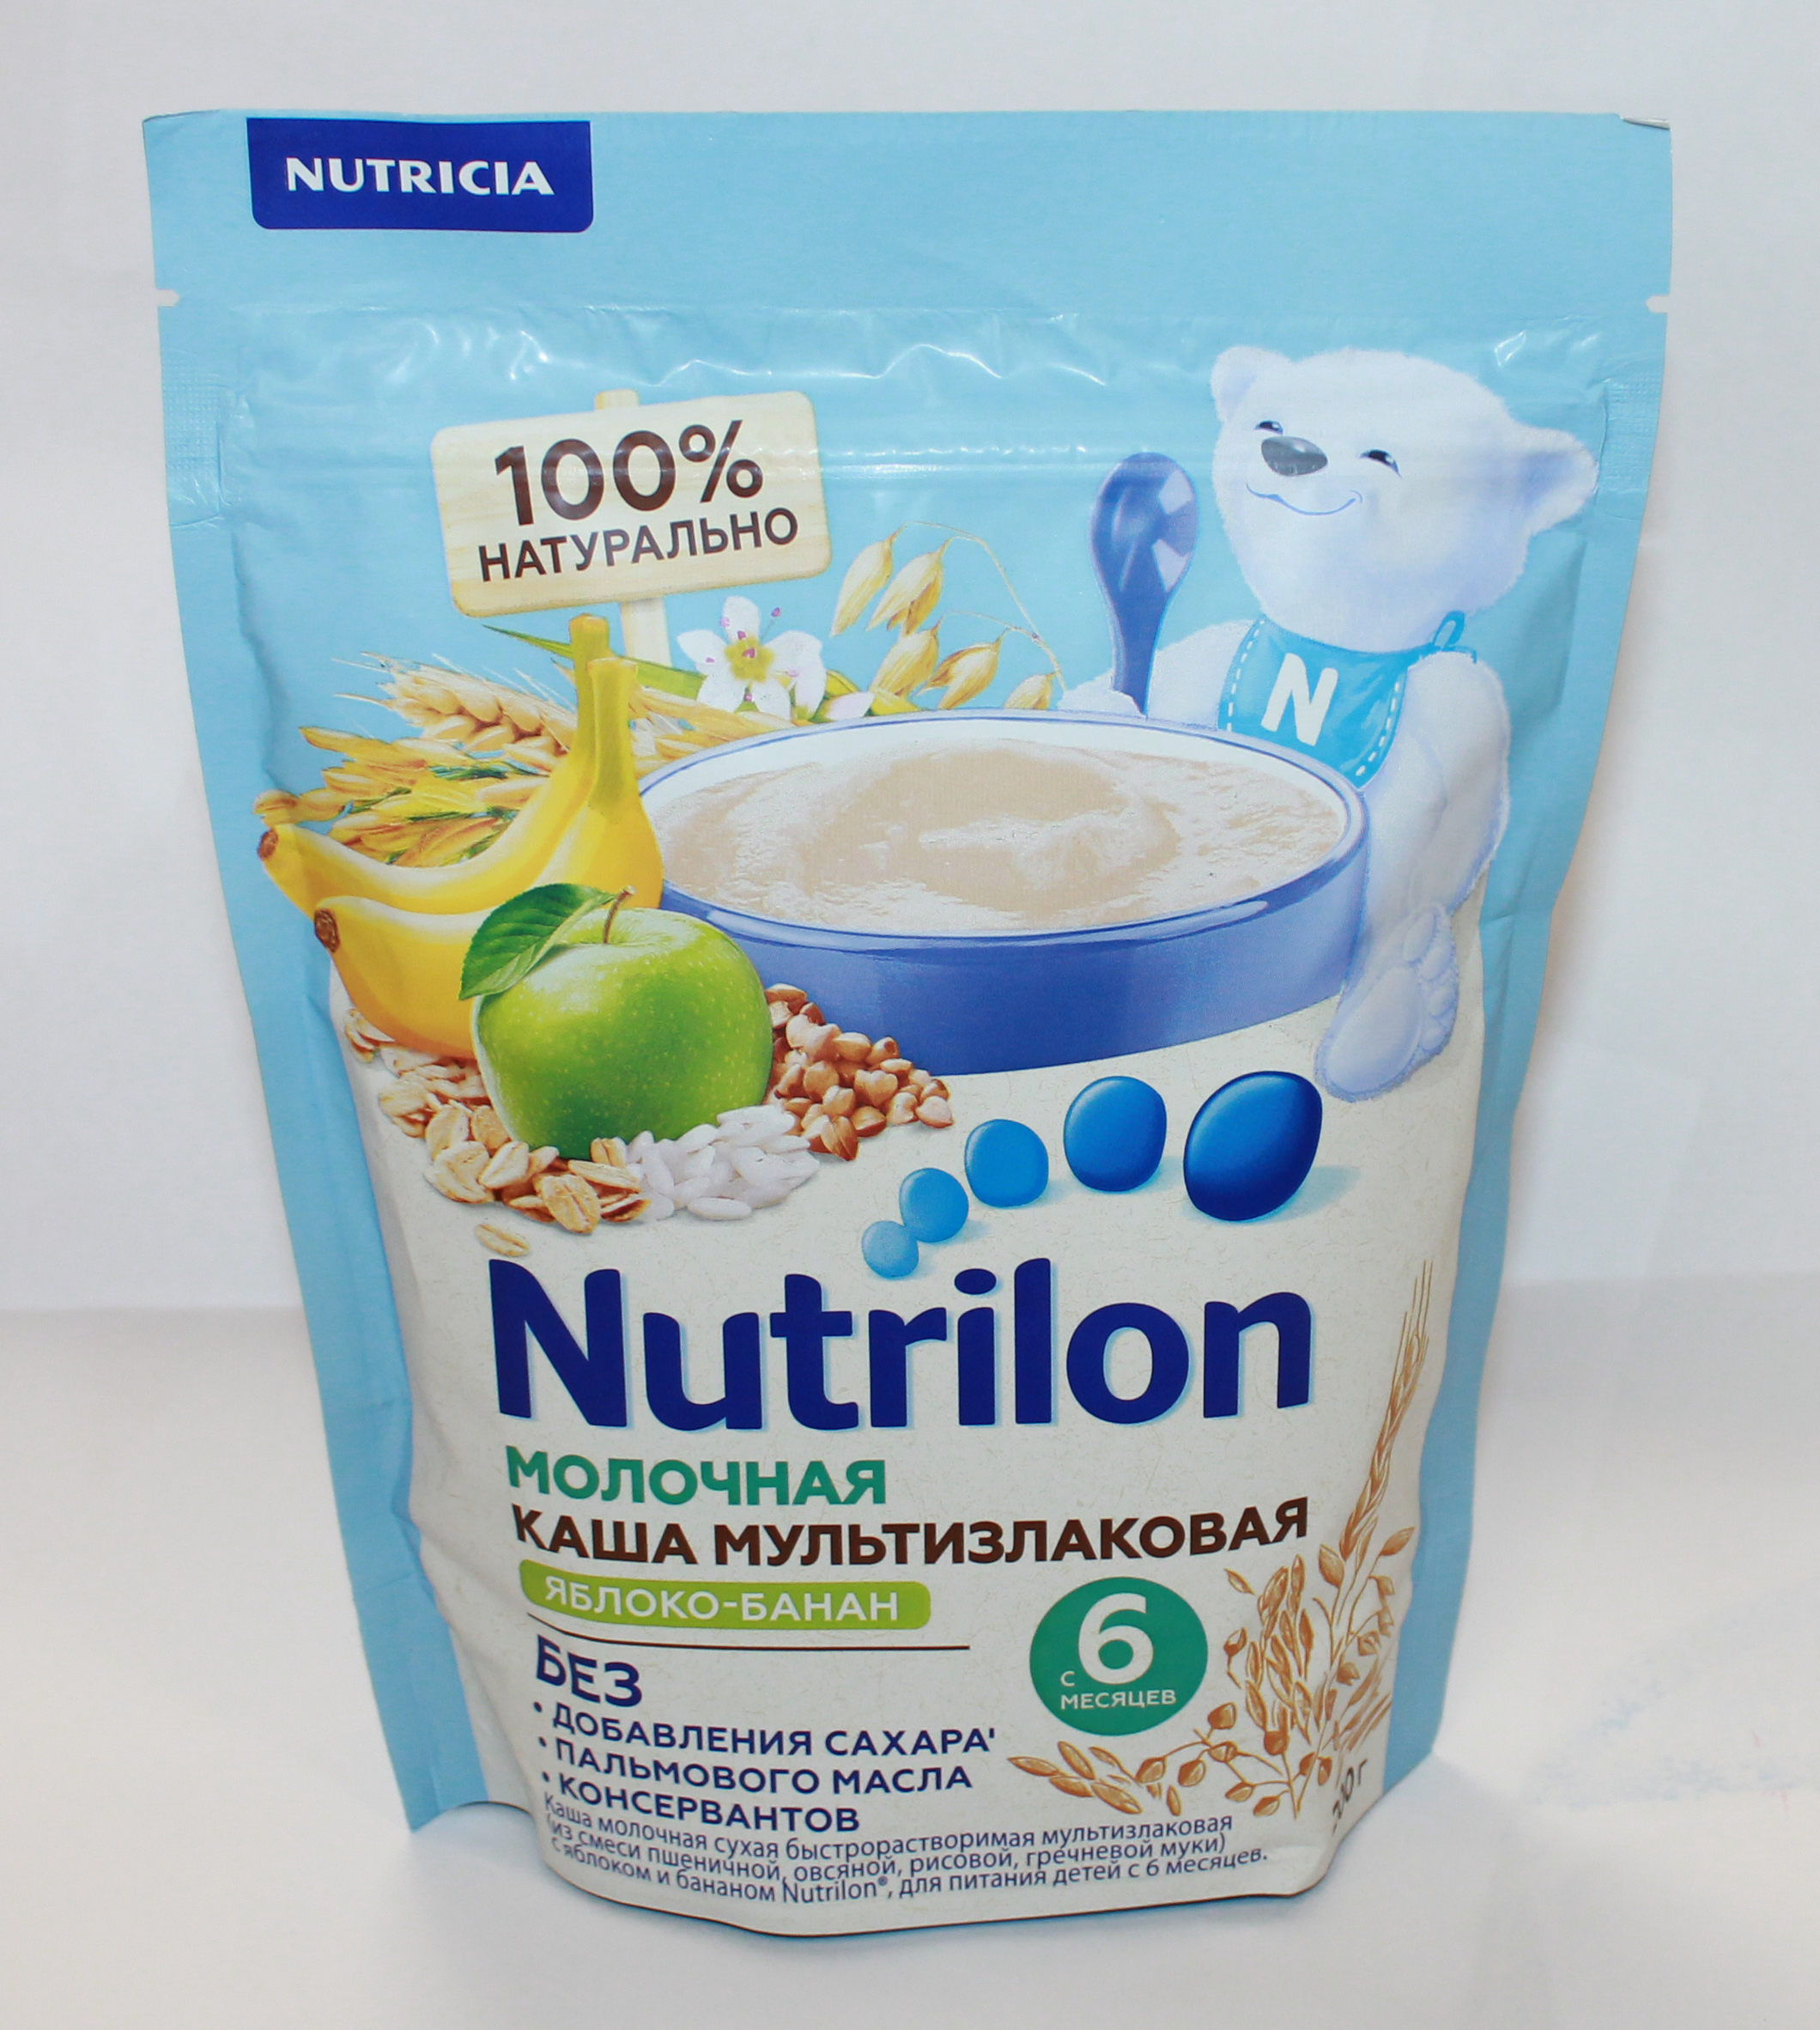 NUTRILON - КАША NUTRILON 200гр МОЛОЧНАЯ МУЛЬТИЗЛАК.ЯБЛ/БАНАН 4600209013458